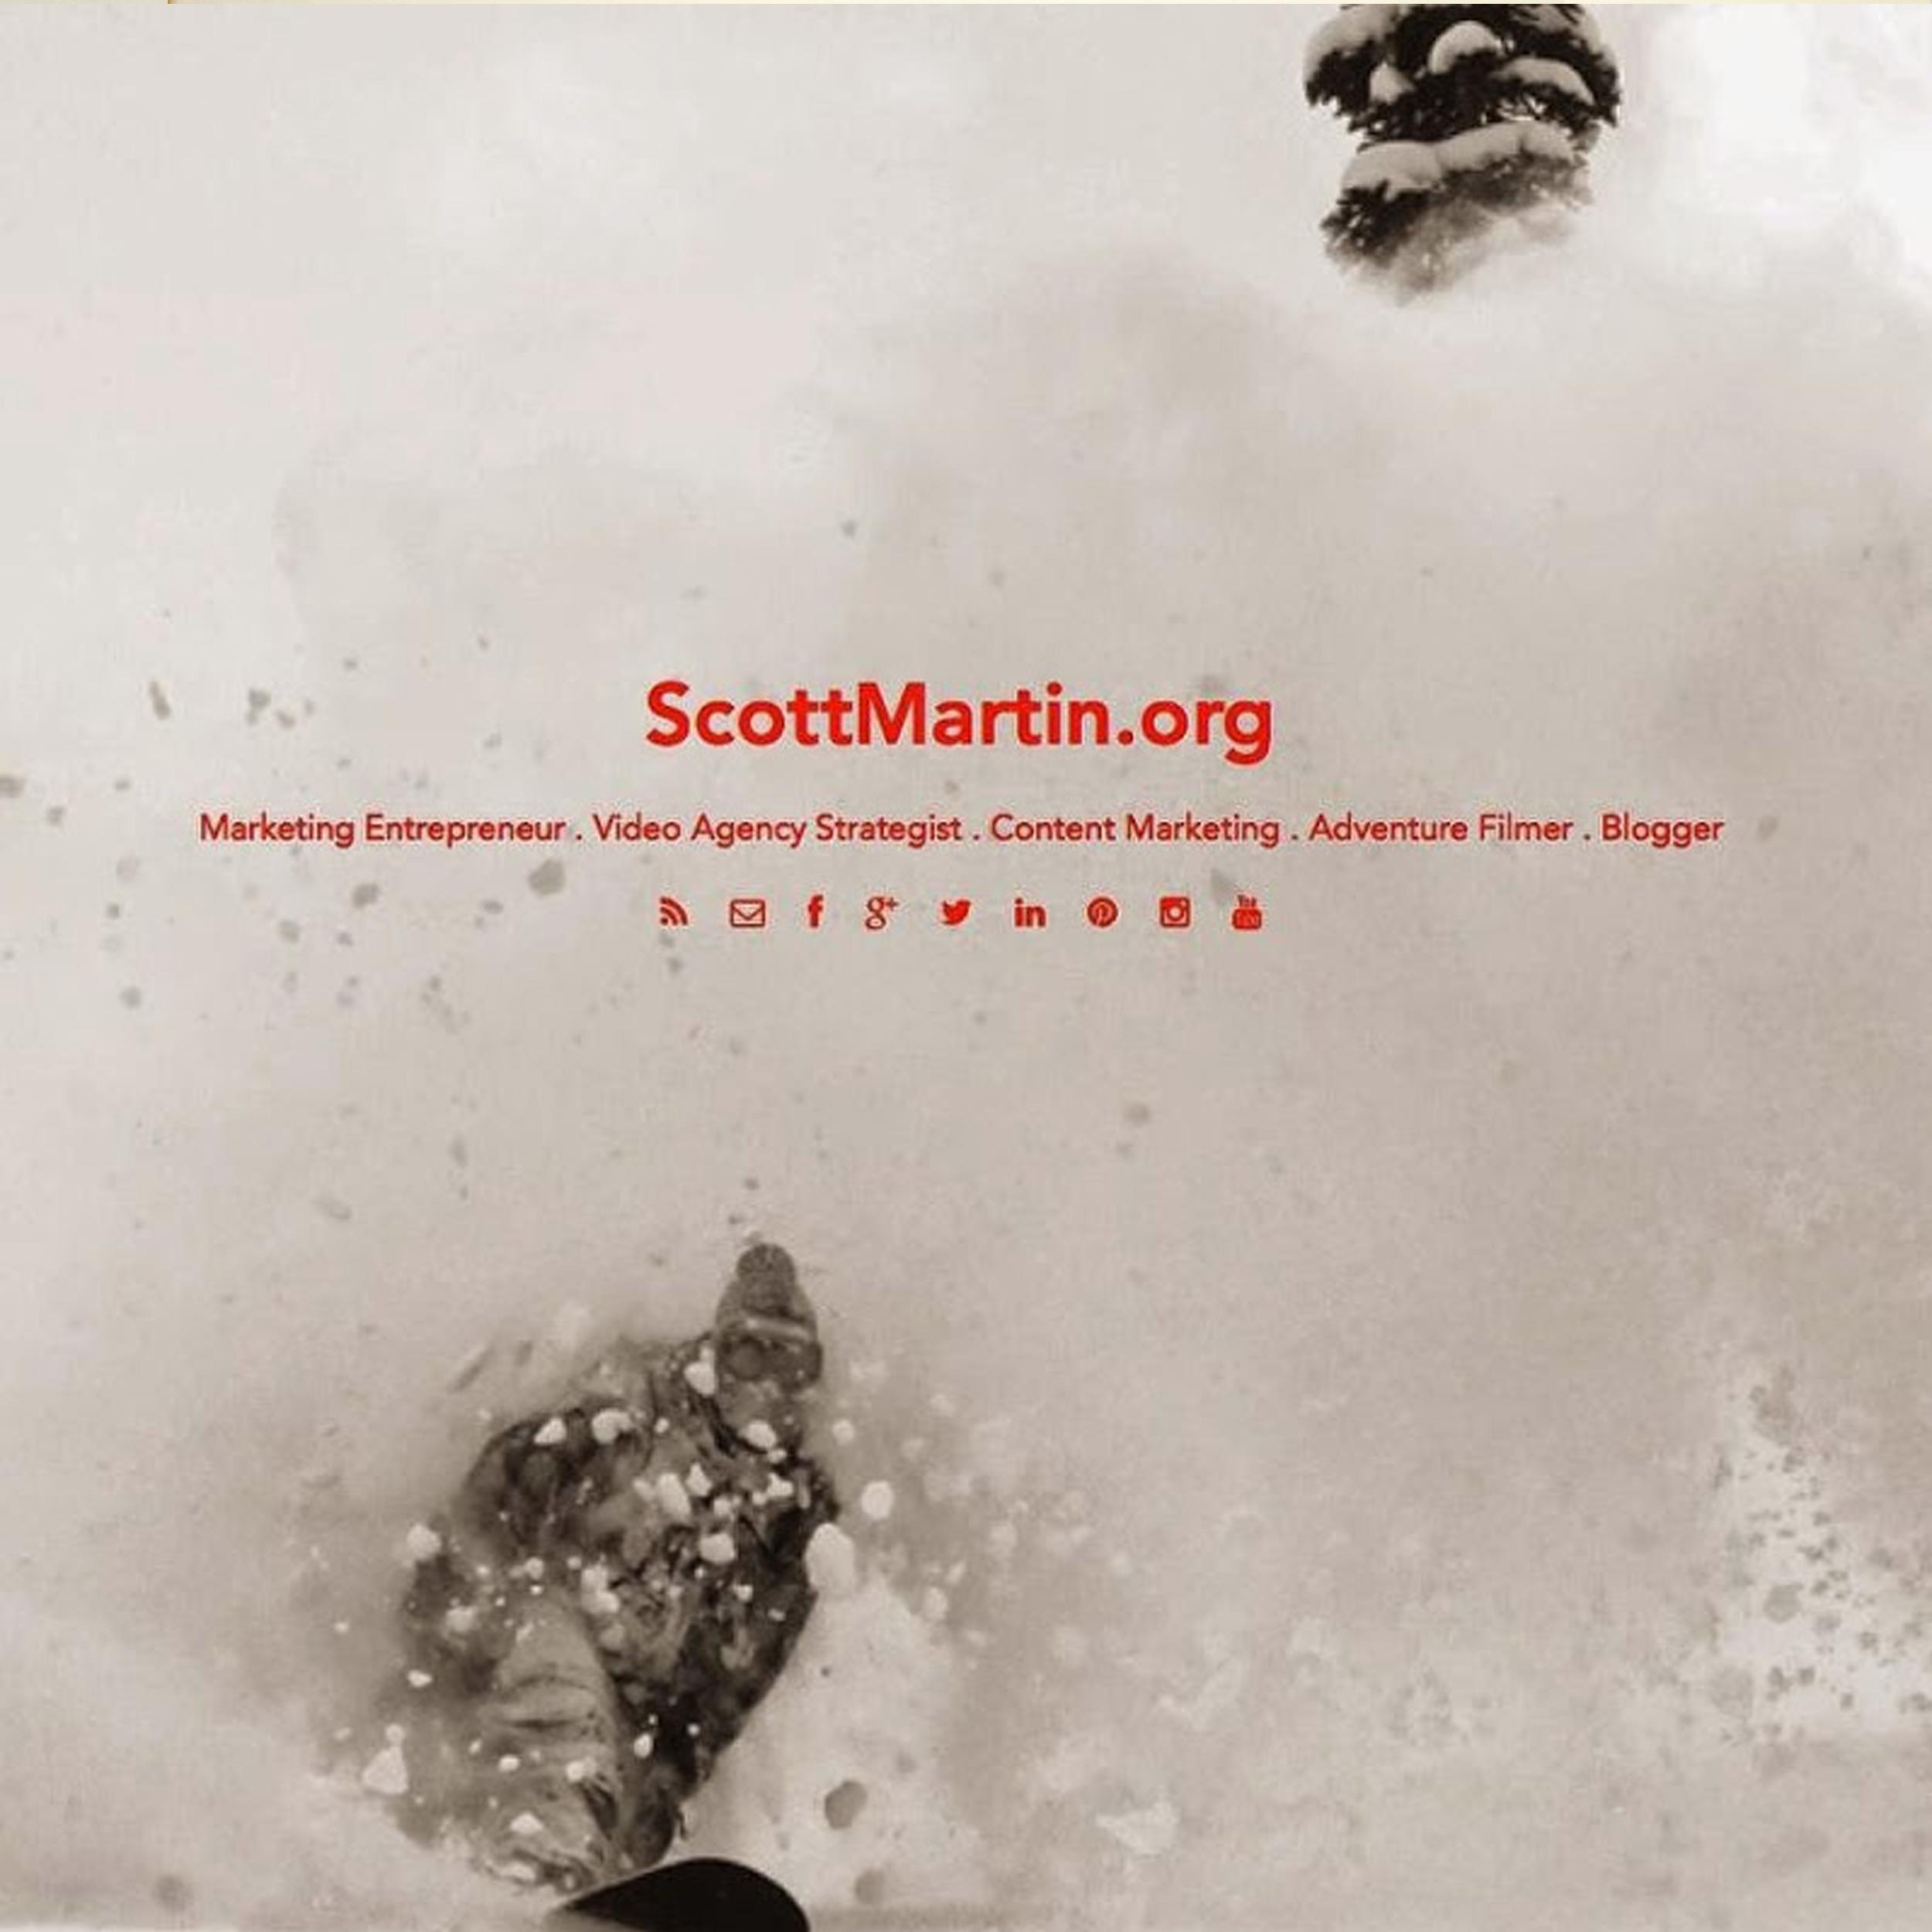 Scottmartin_org.jpeg